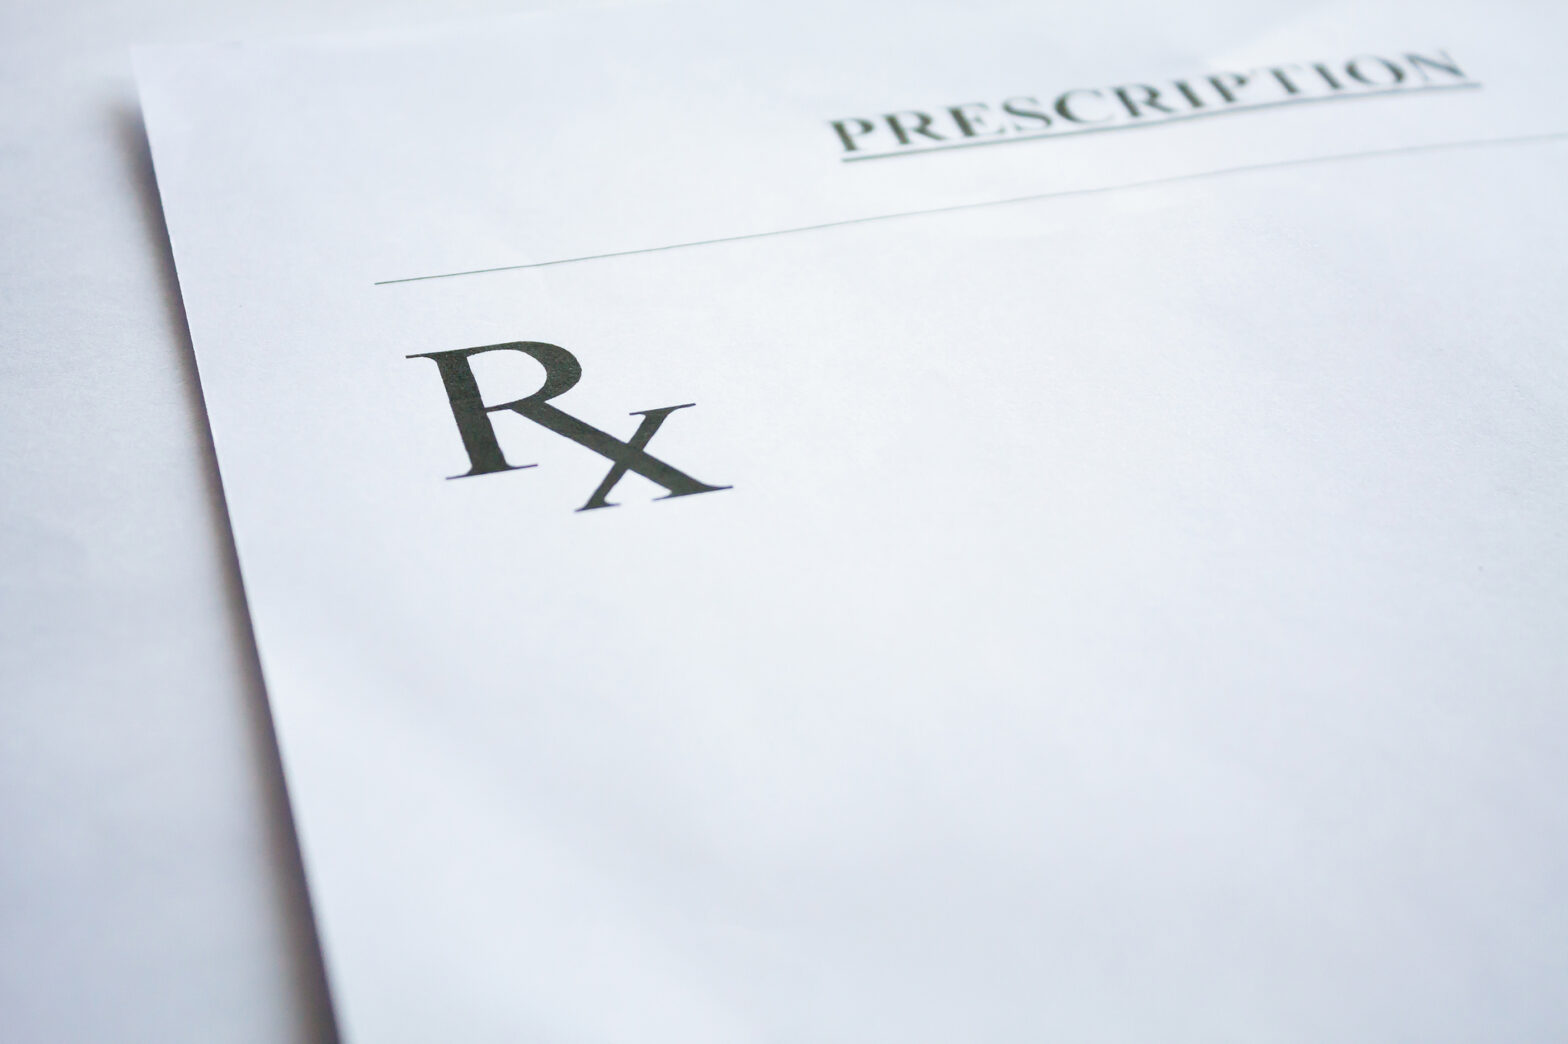 rx_prescription_pad_image